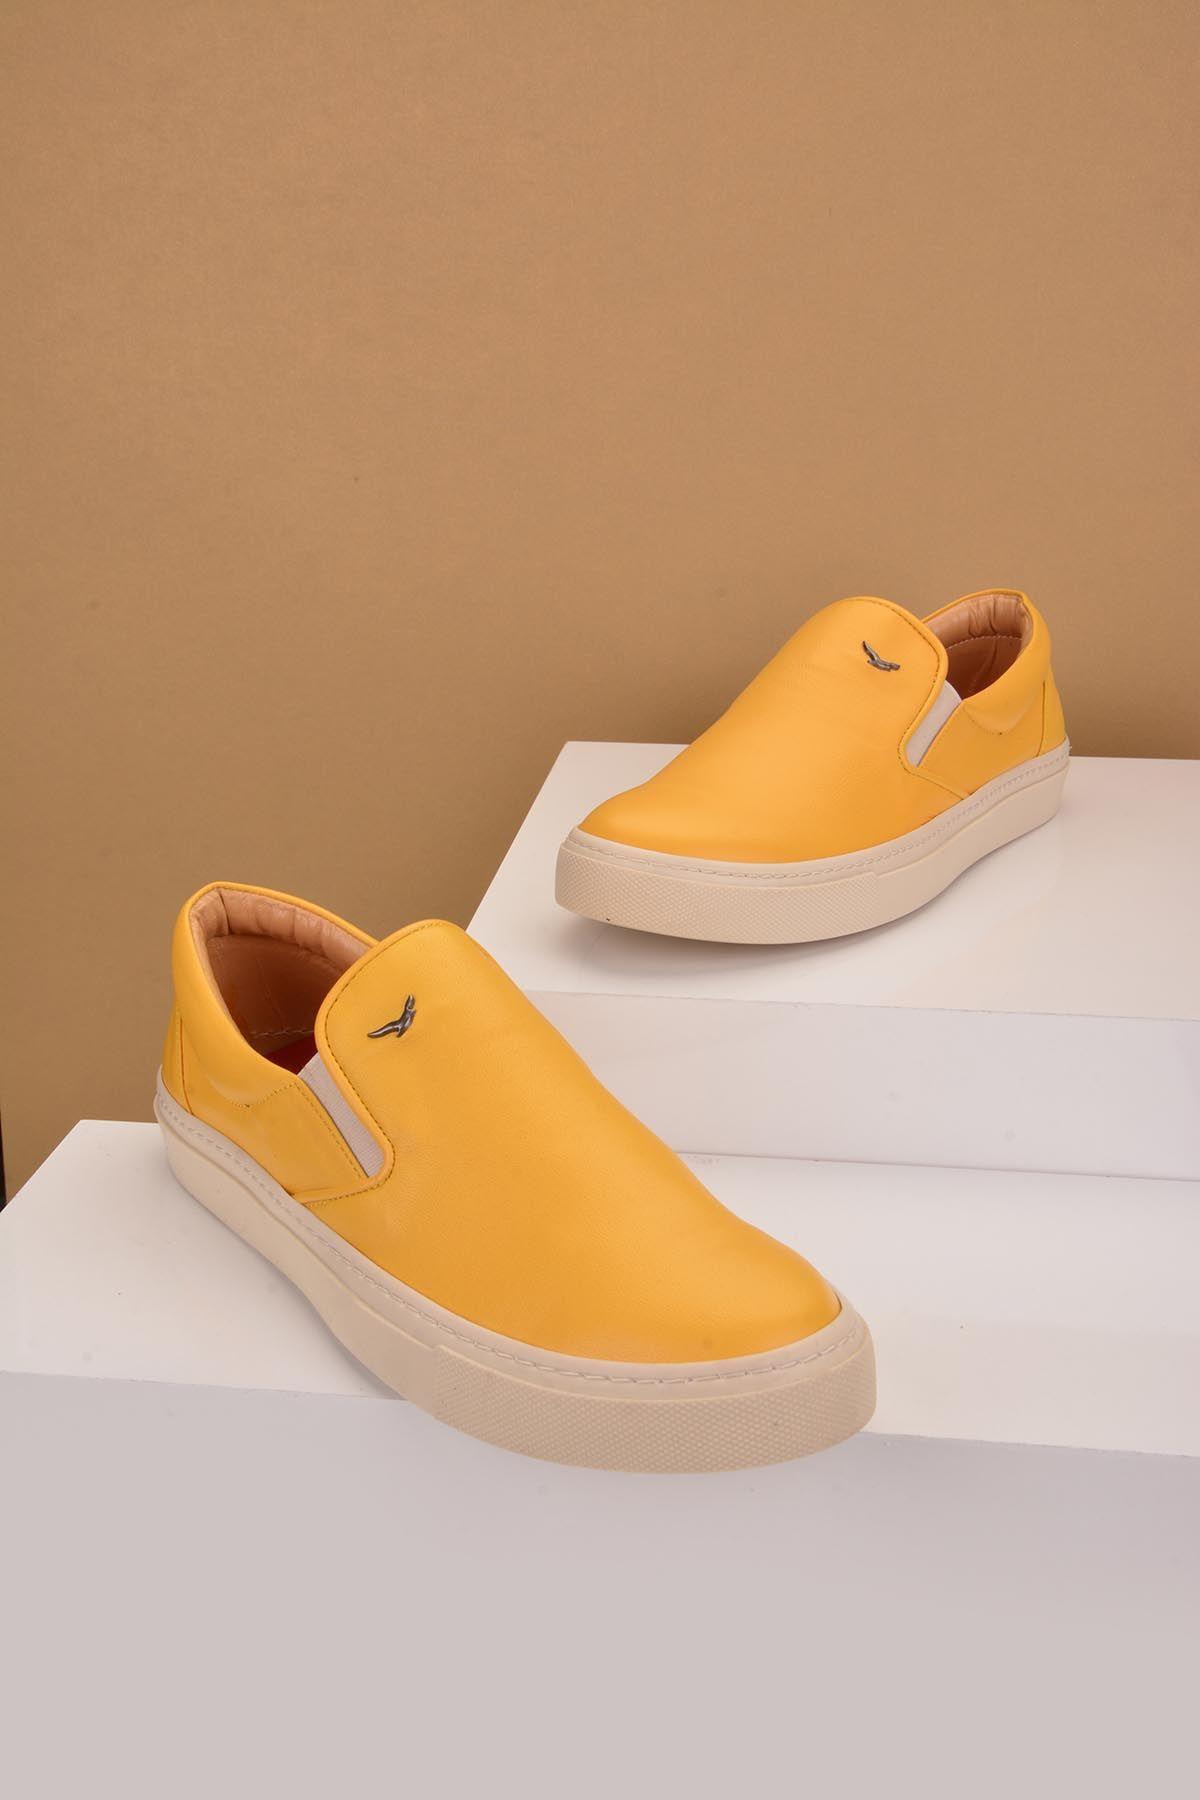 Art Goya Women Sneakers From Genuine Leather Yellow